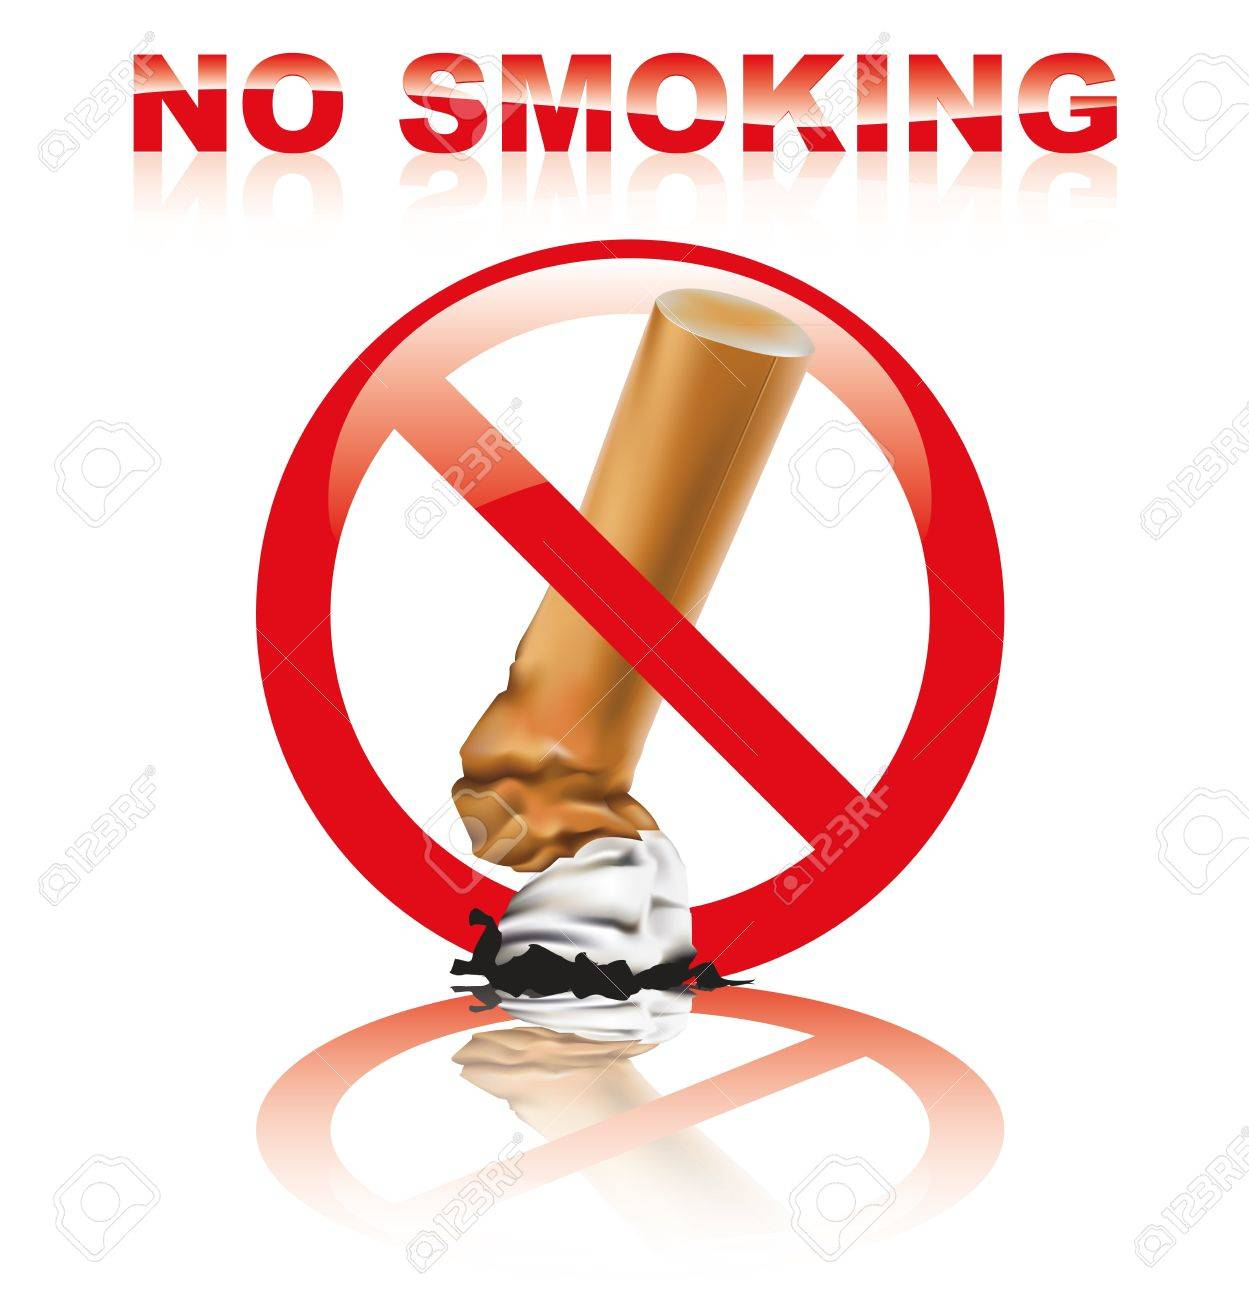 No smoking sign Stock Vector - 10461713